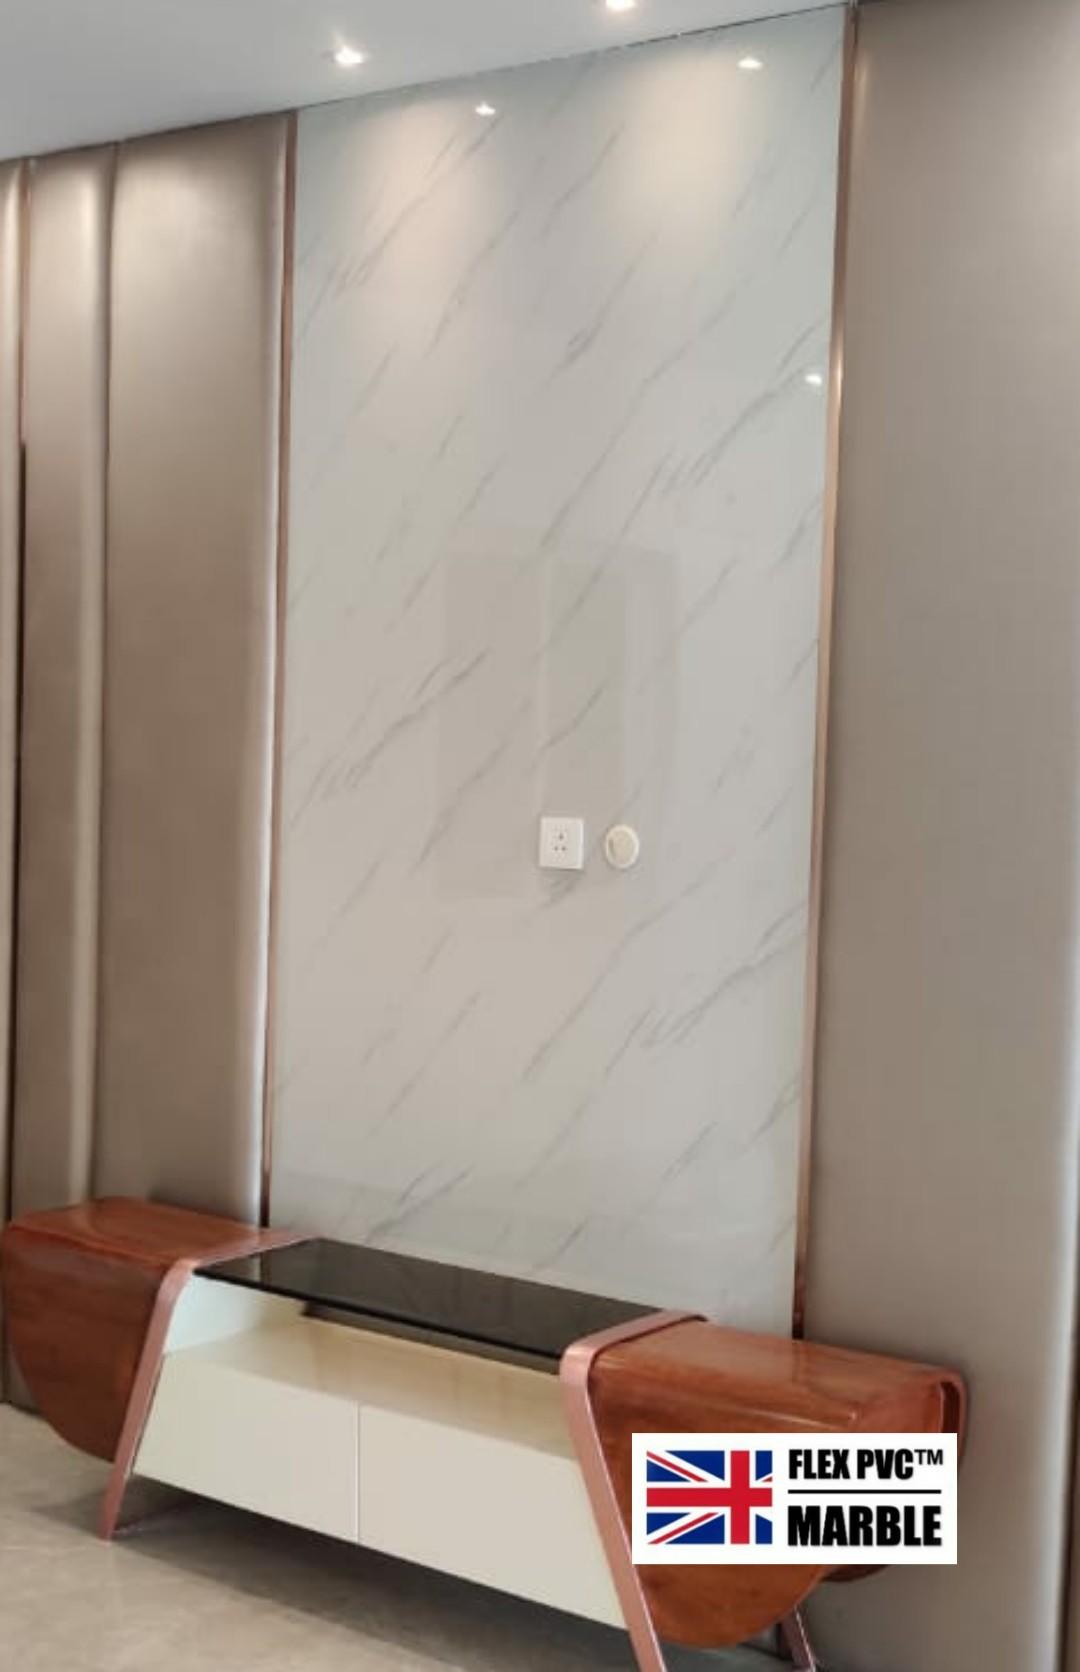 TV background pvc uv marble